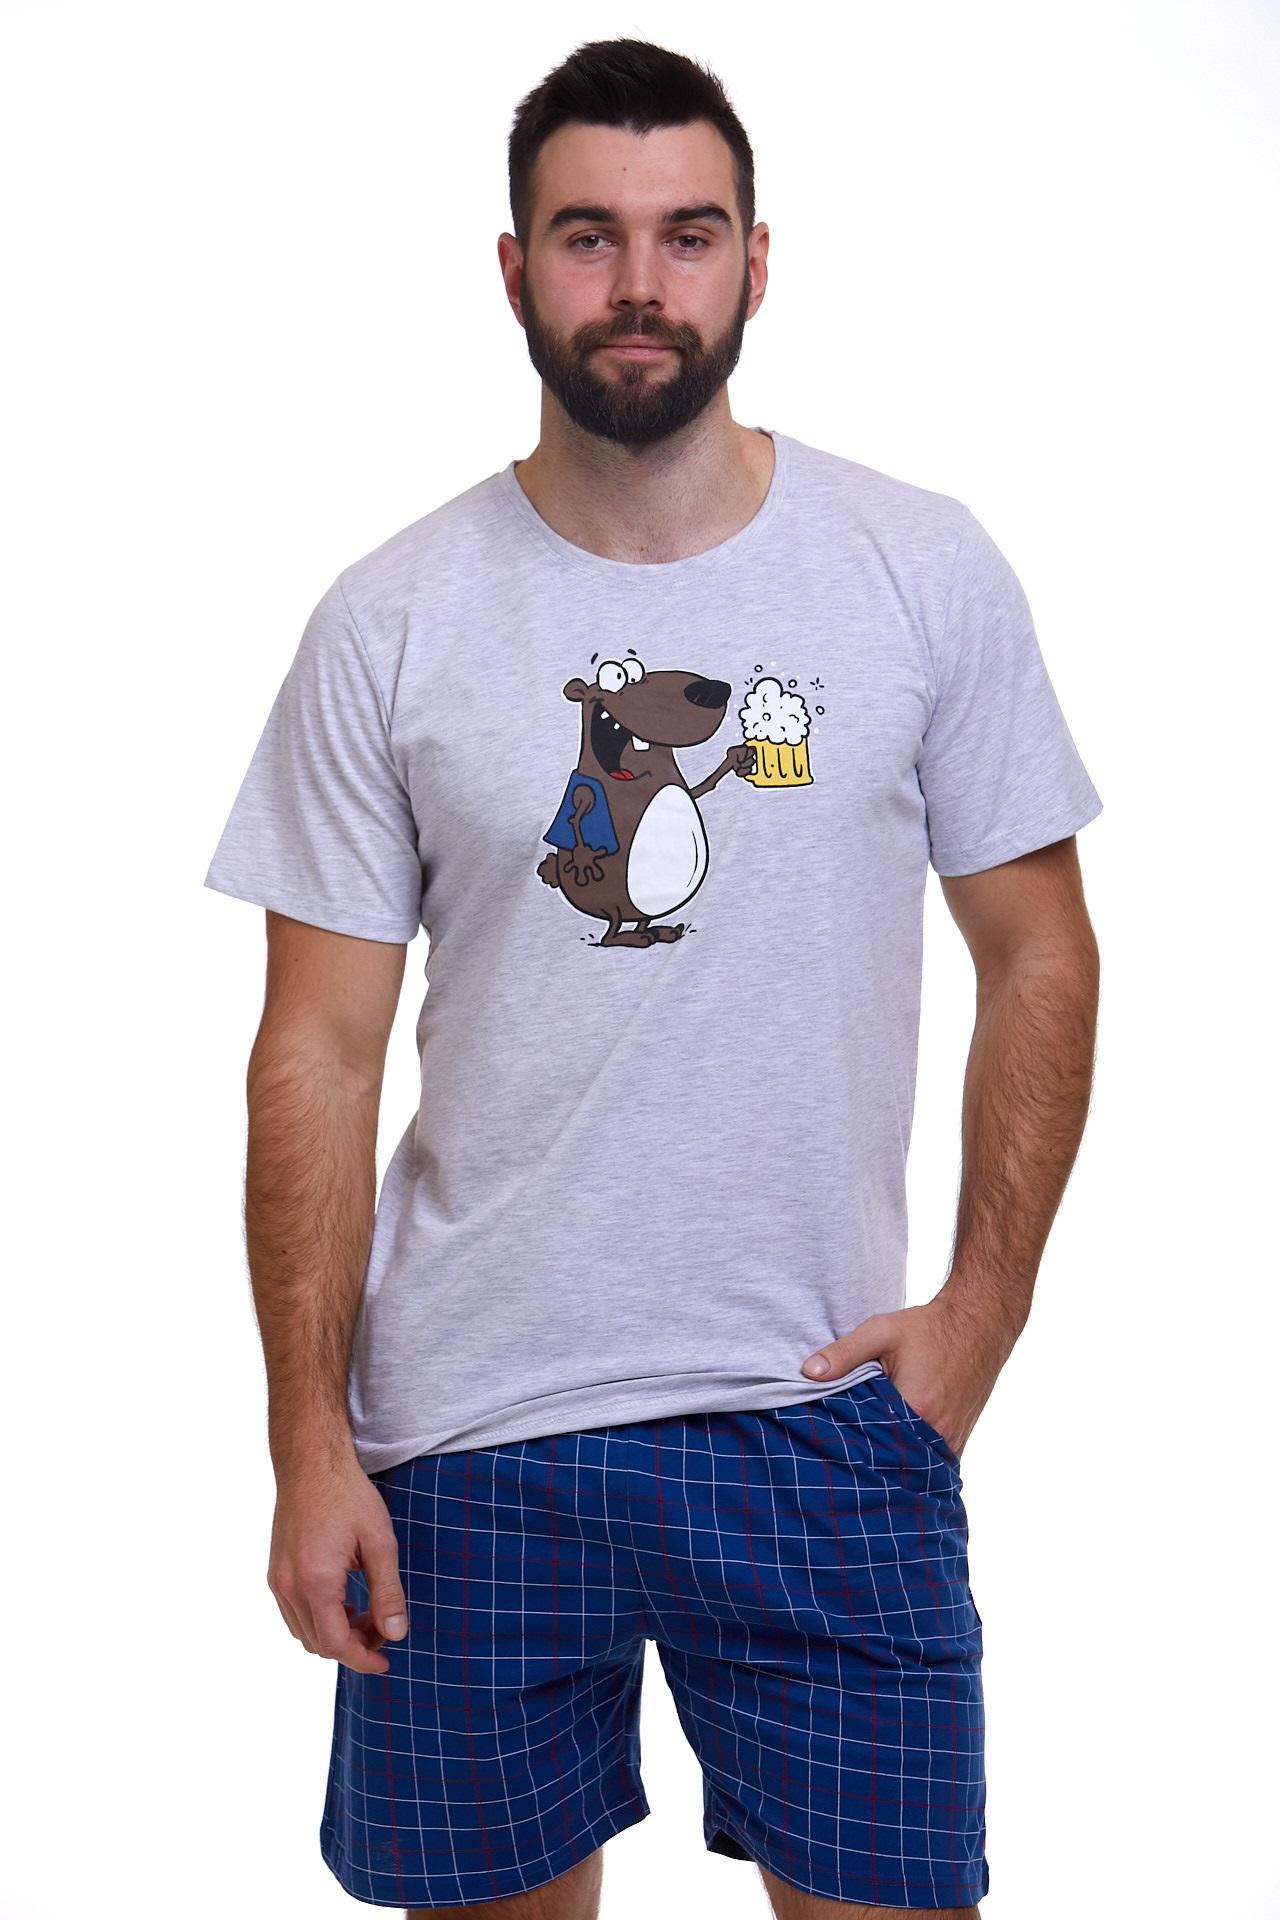 Pyžamo pro muže Joo Pivečko! 1P1101